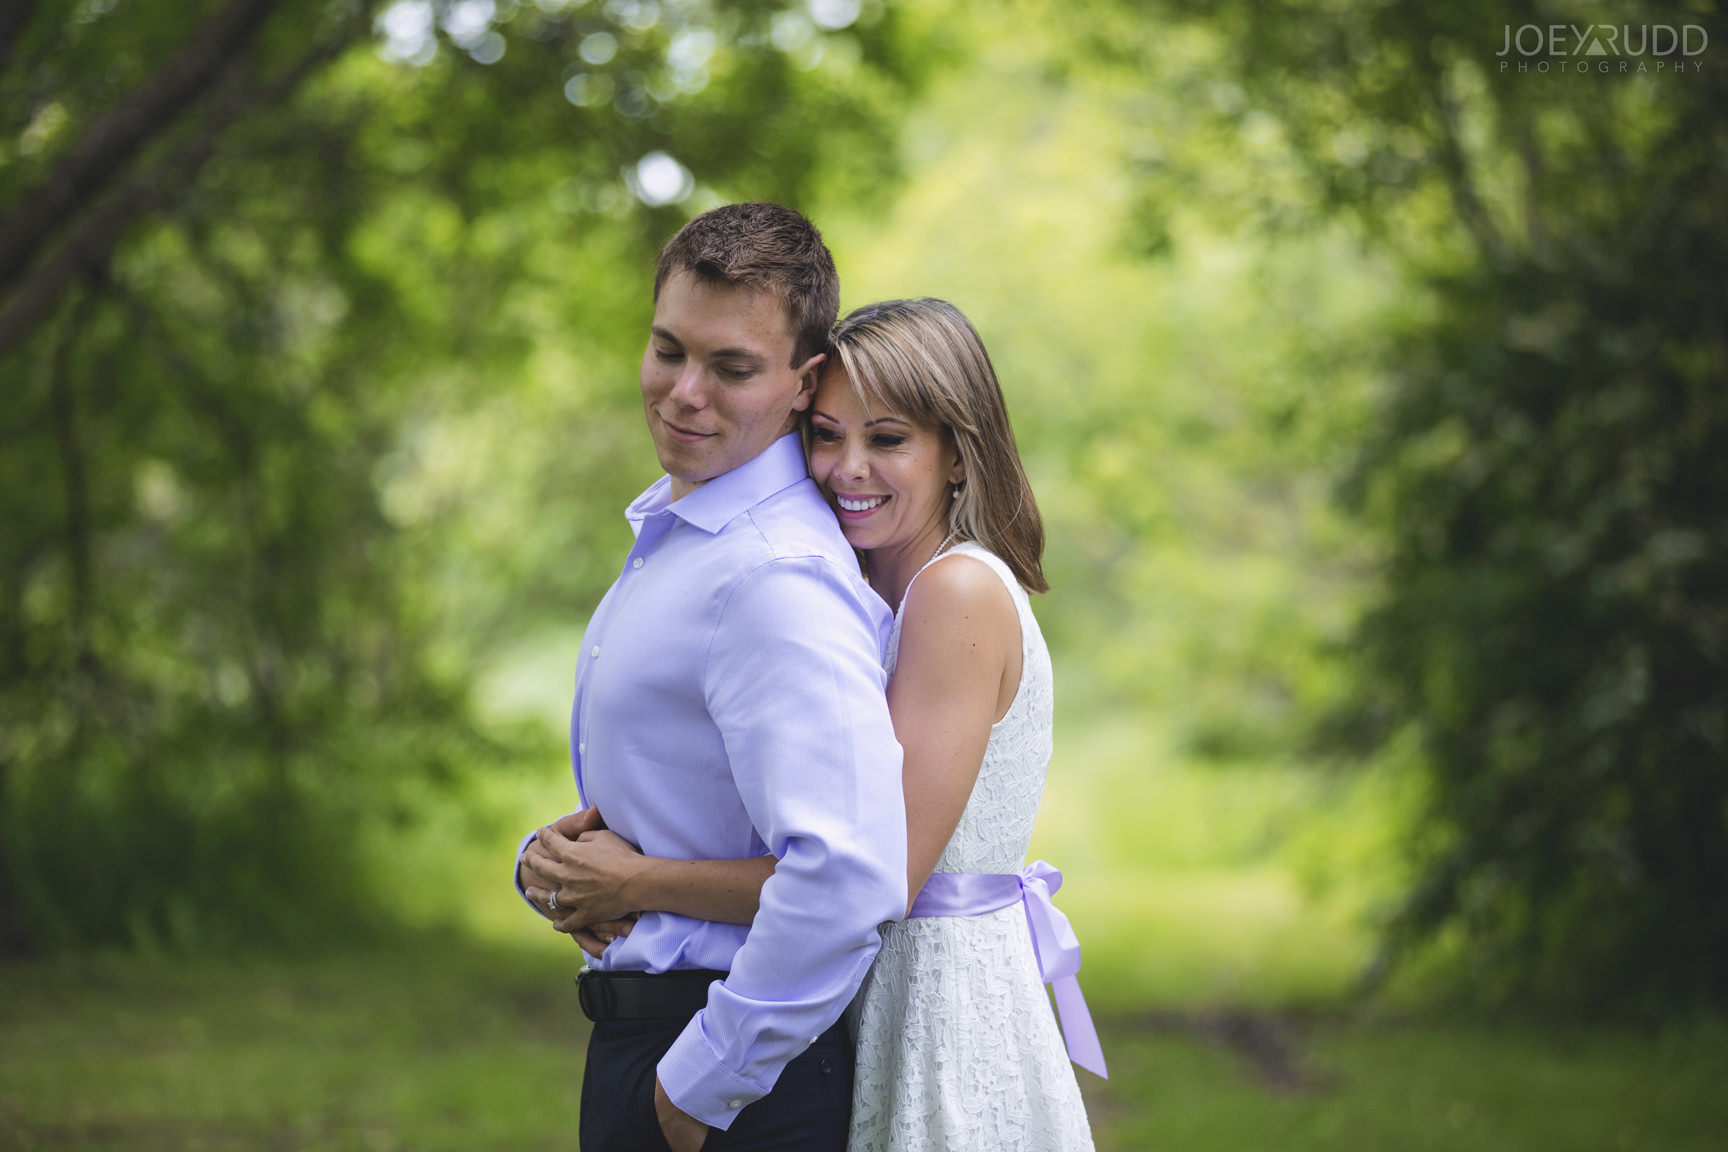 Elopement Wedding Ottawa Photographer Elope Photography Joey Rudd Photographer lifestyle